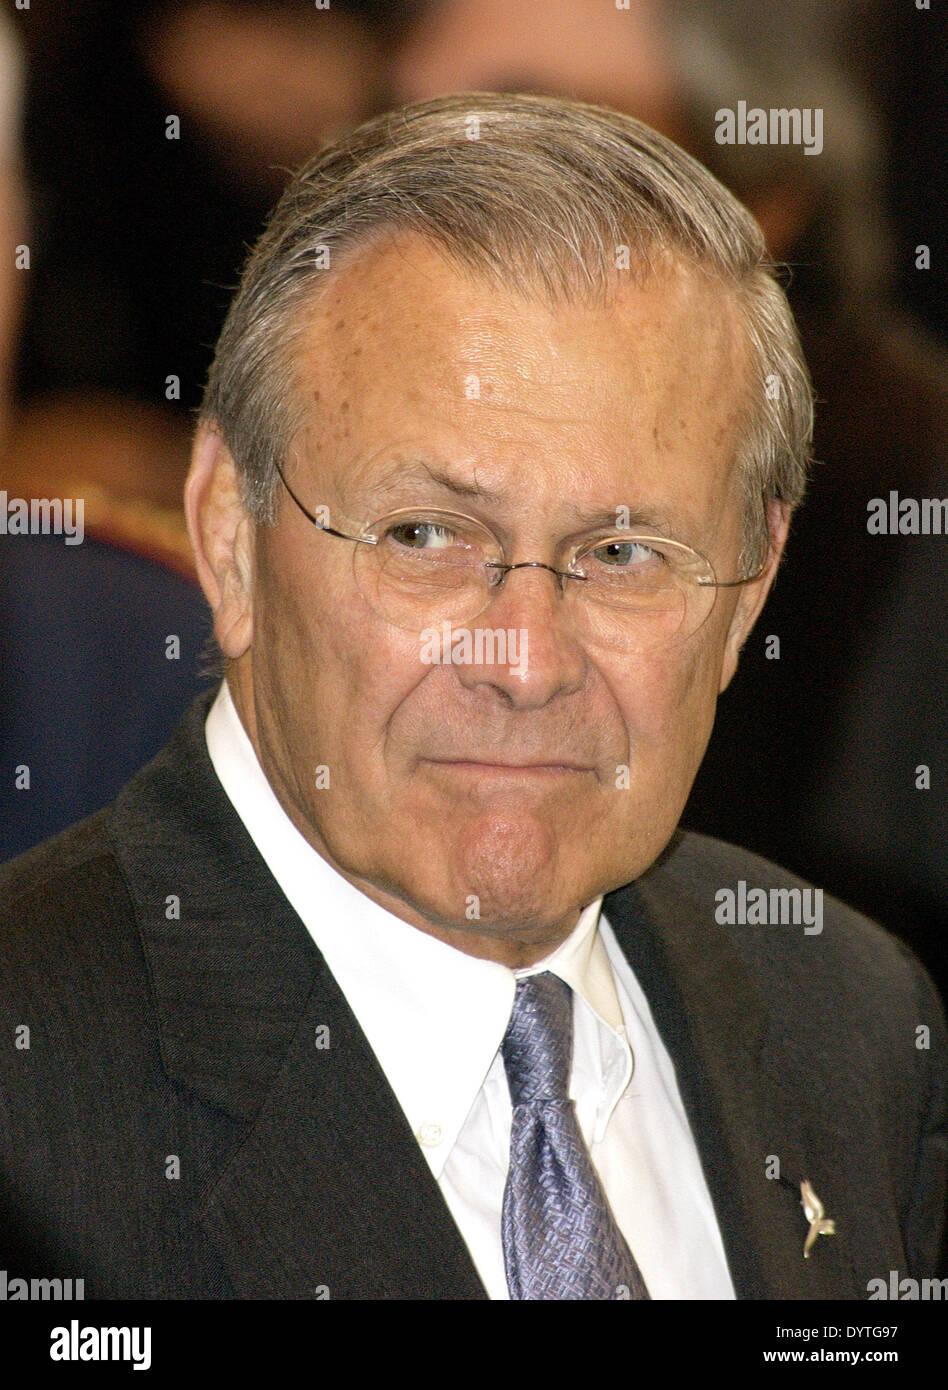 Donald H. Rumsfeld - Stock Image